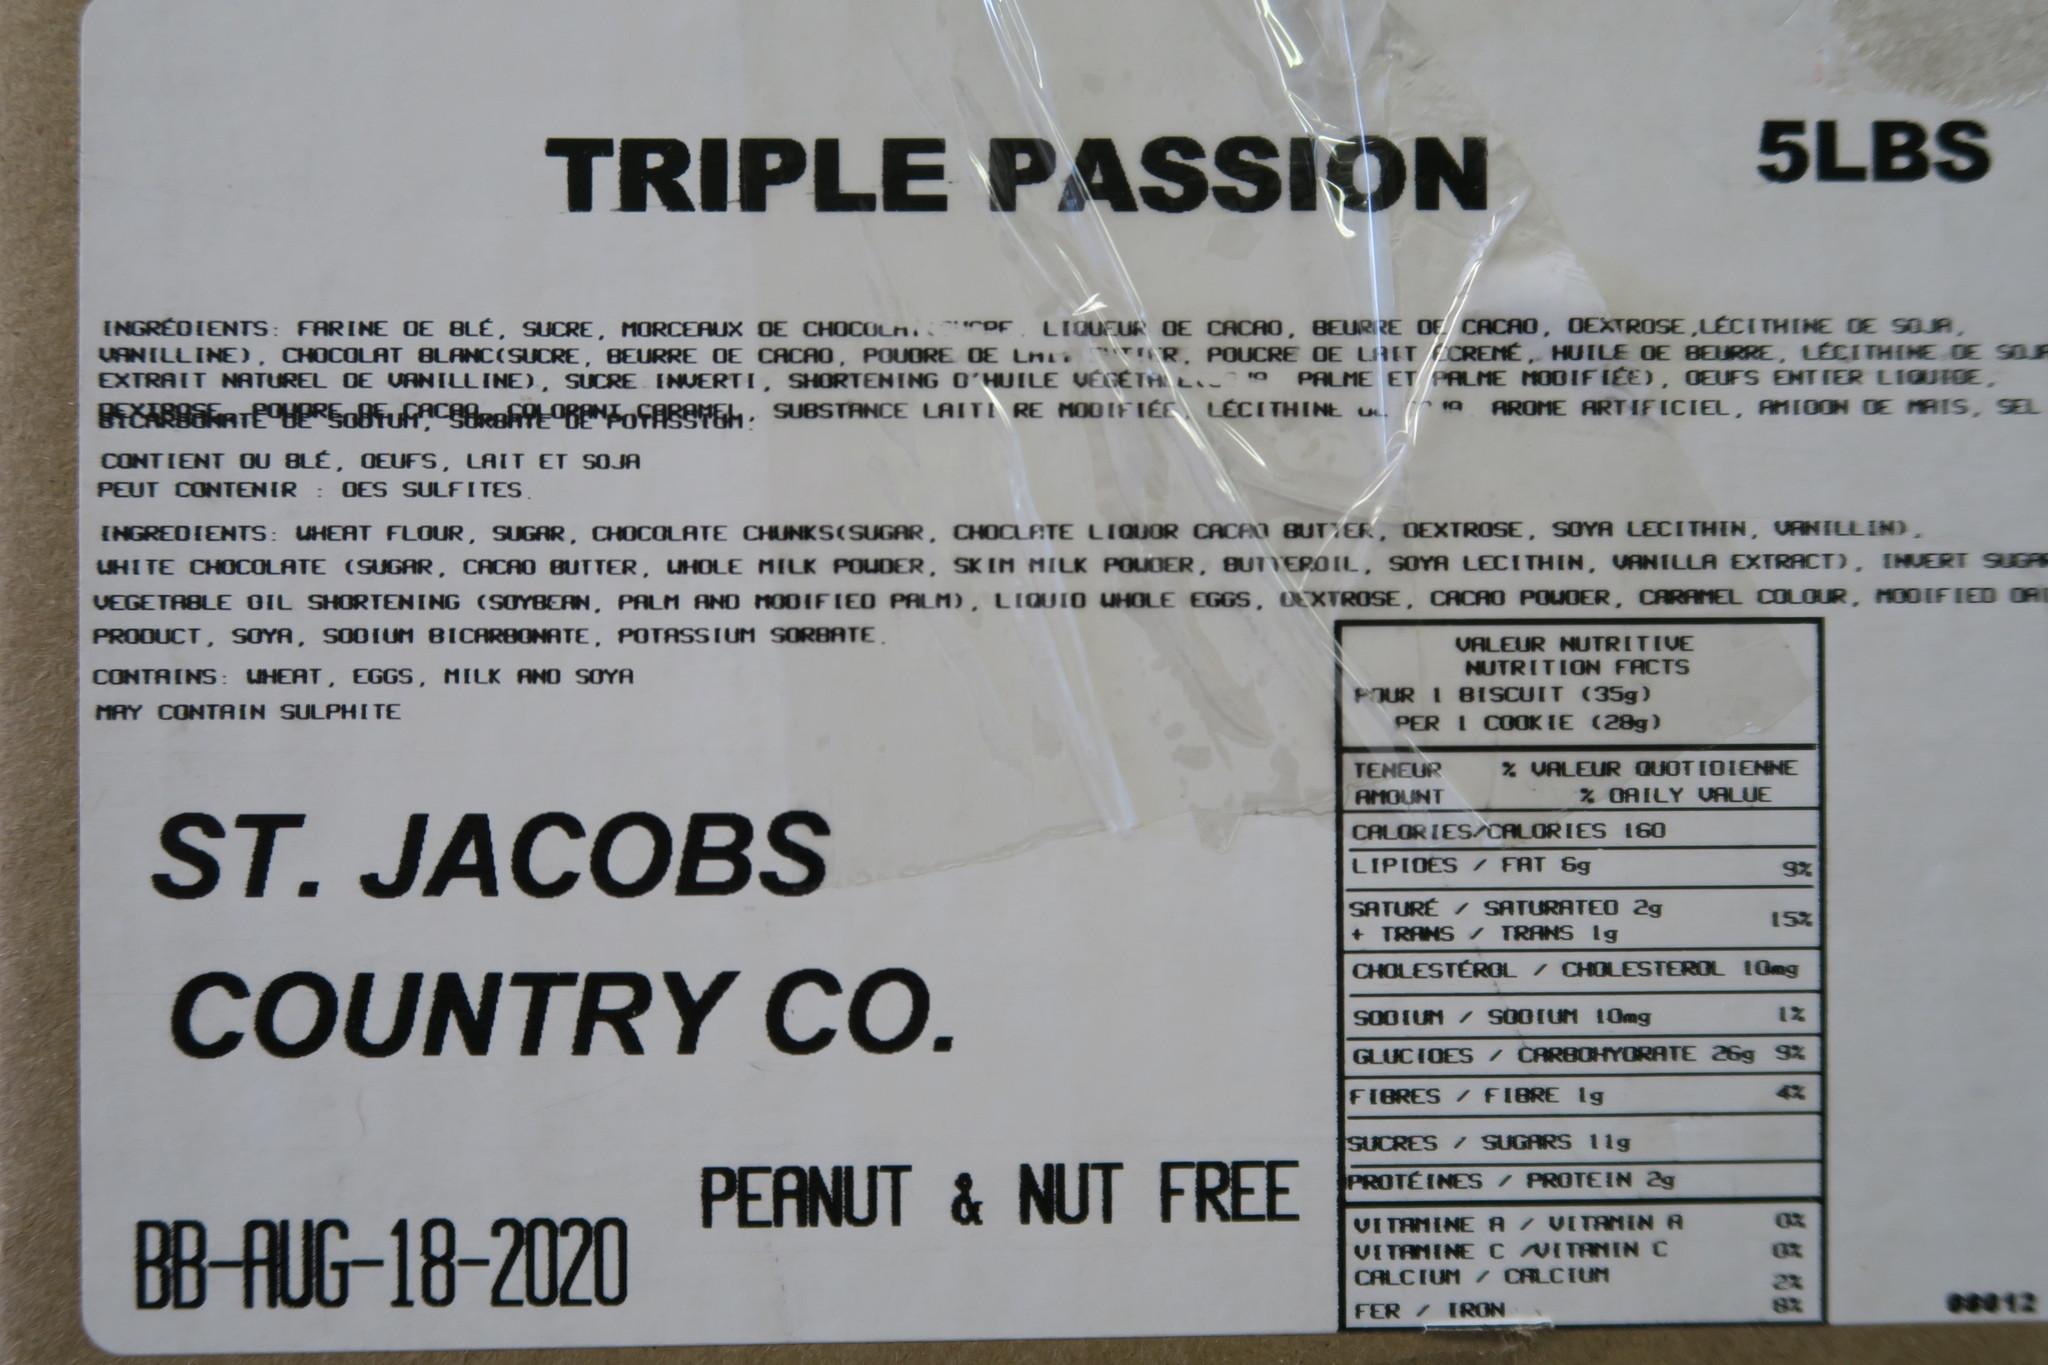 St Jacobs Country Bulk Triple Passion 5lb Box